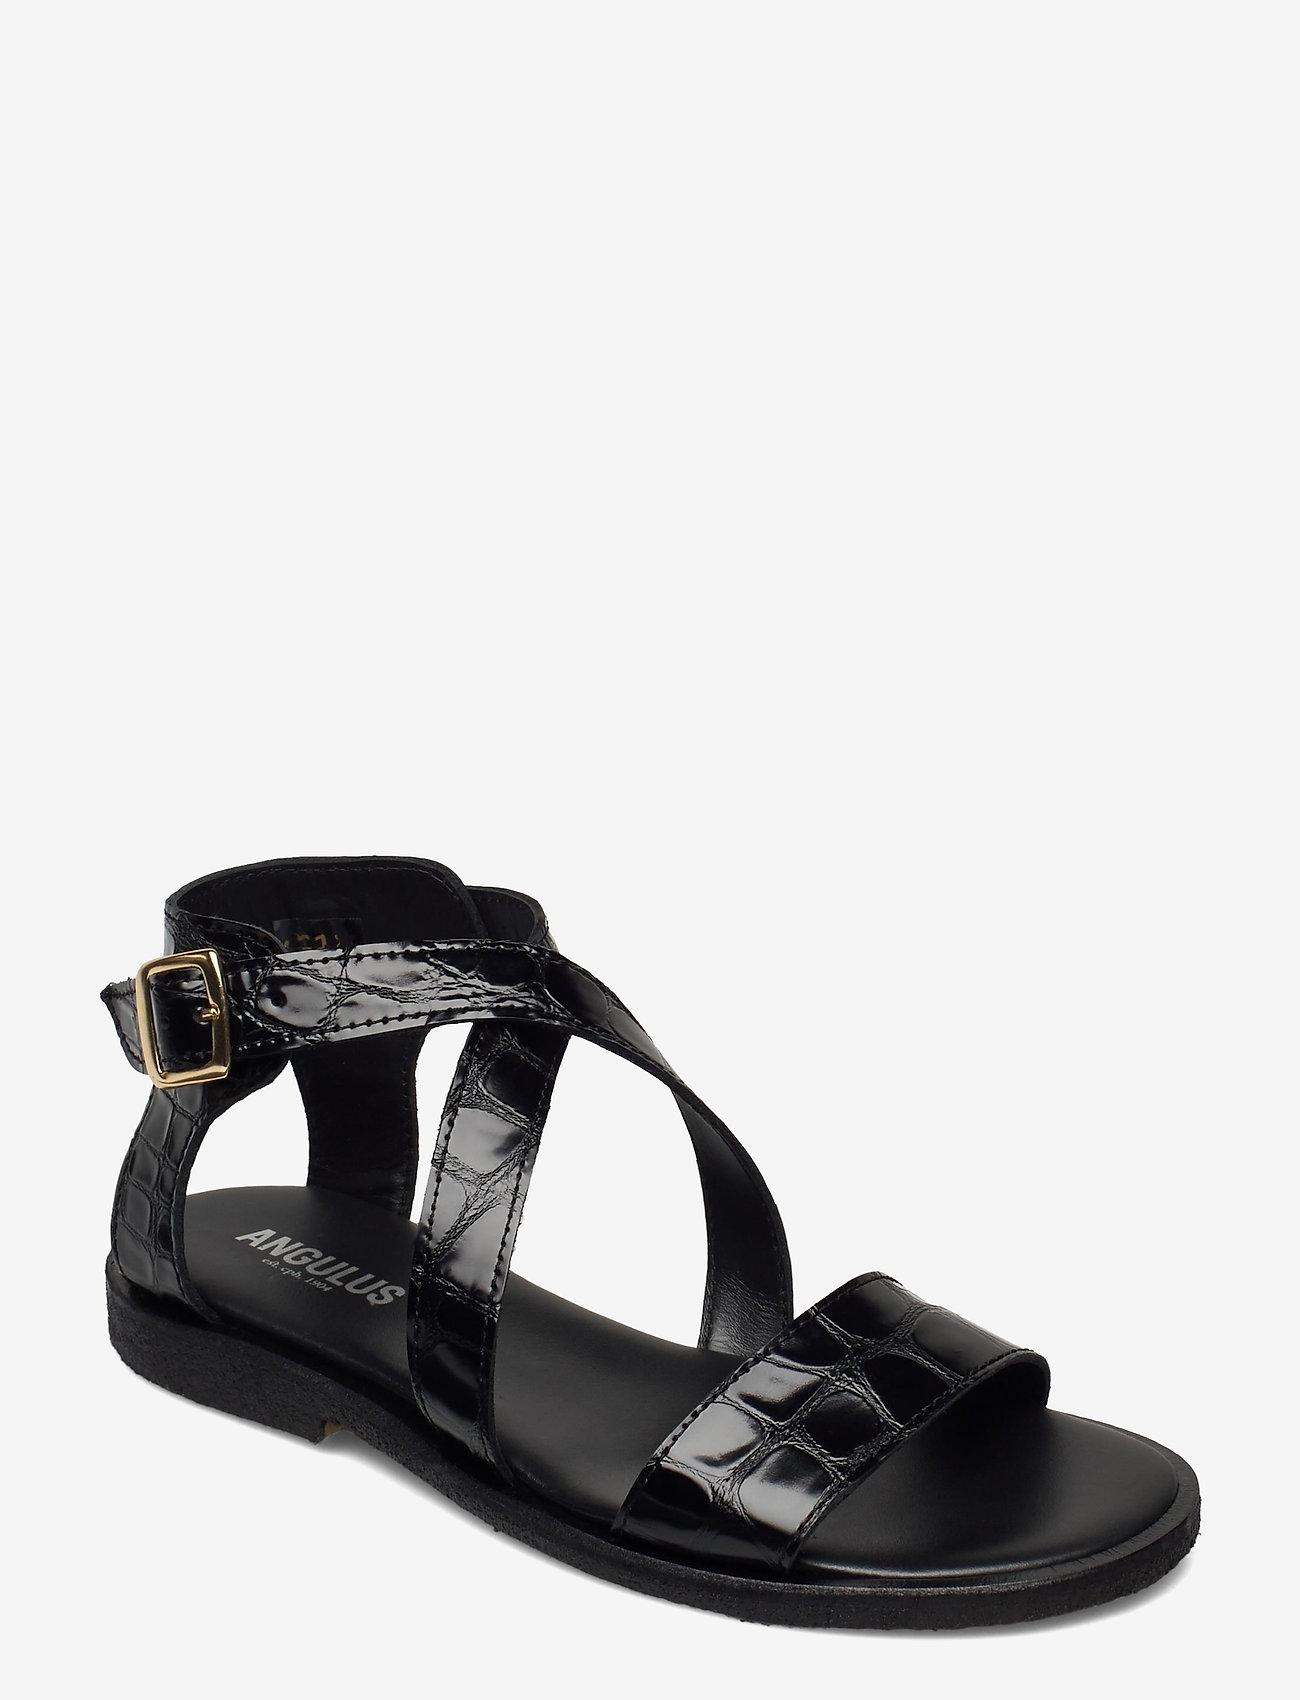 ANGULUS - 5442 - flache sandalen - 1674 black croco - 0